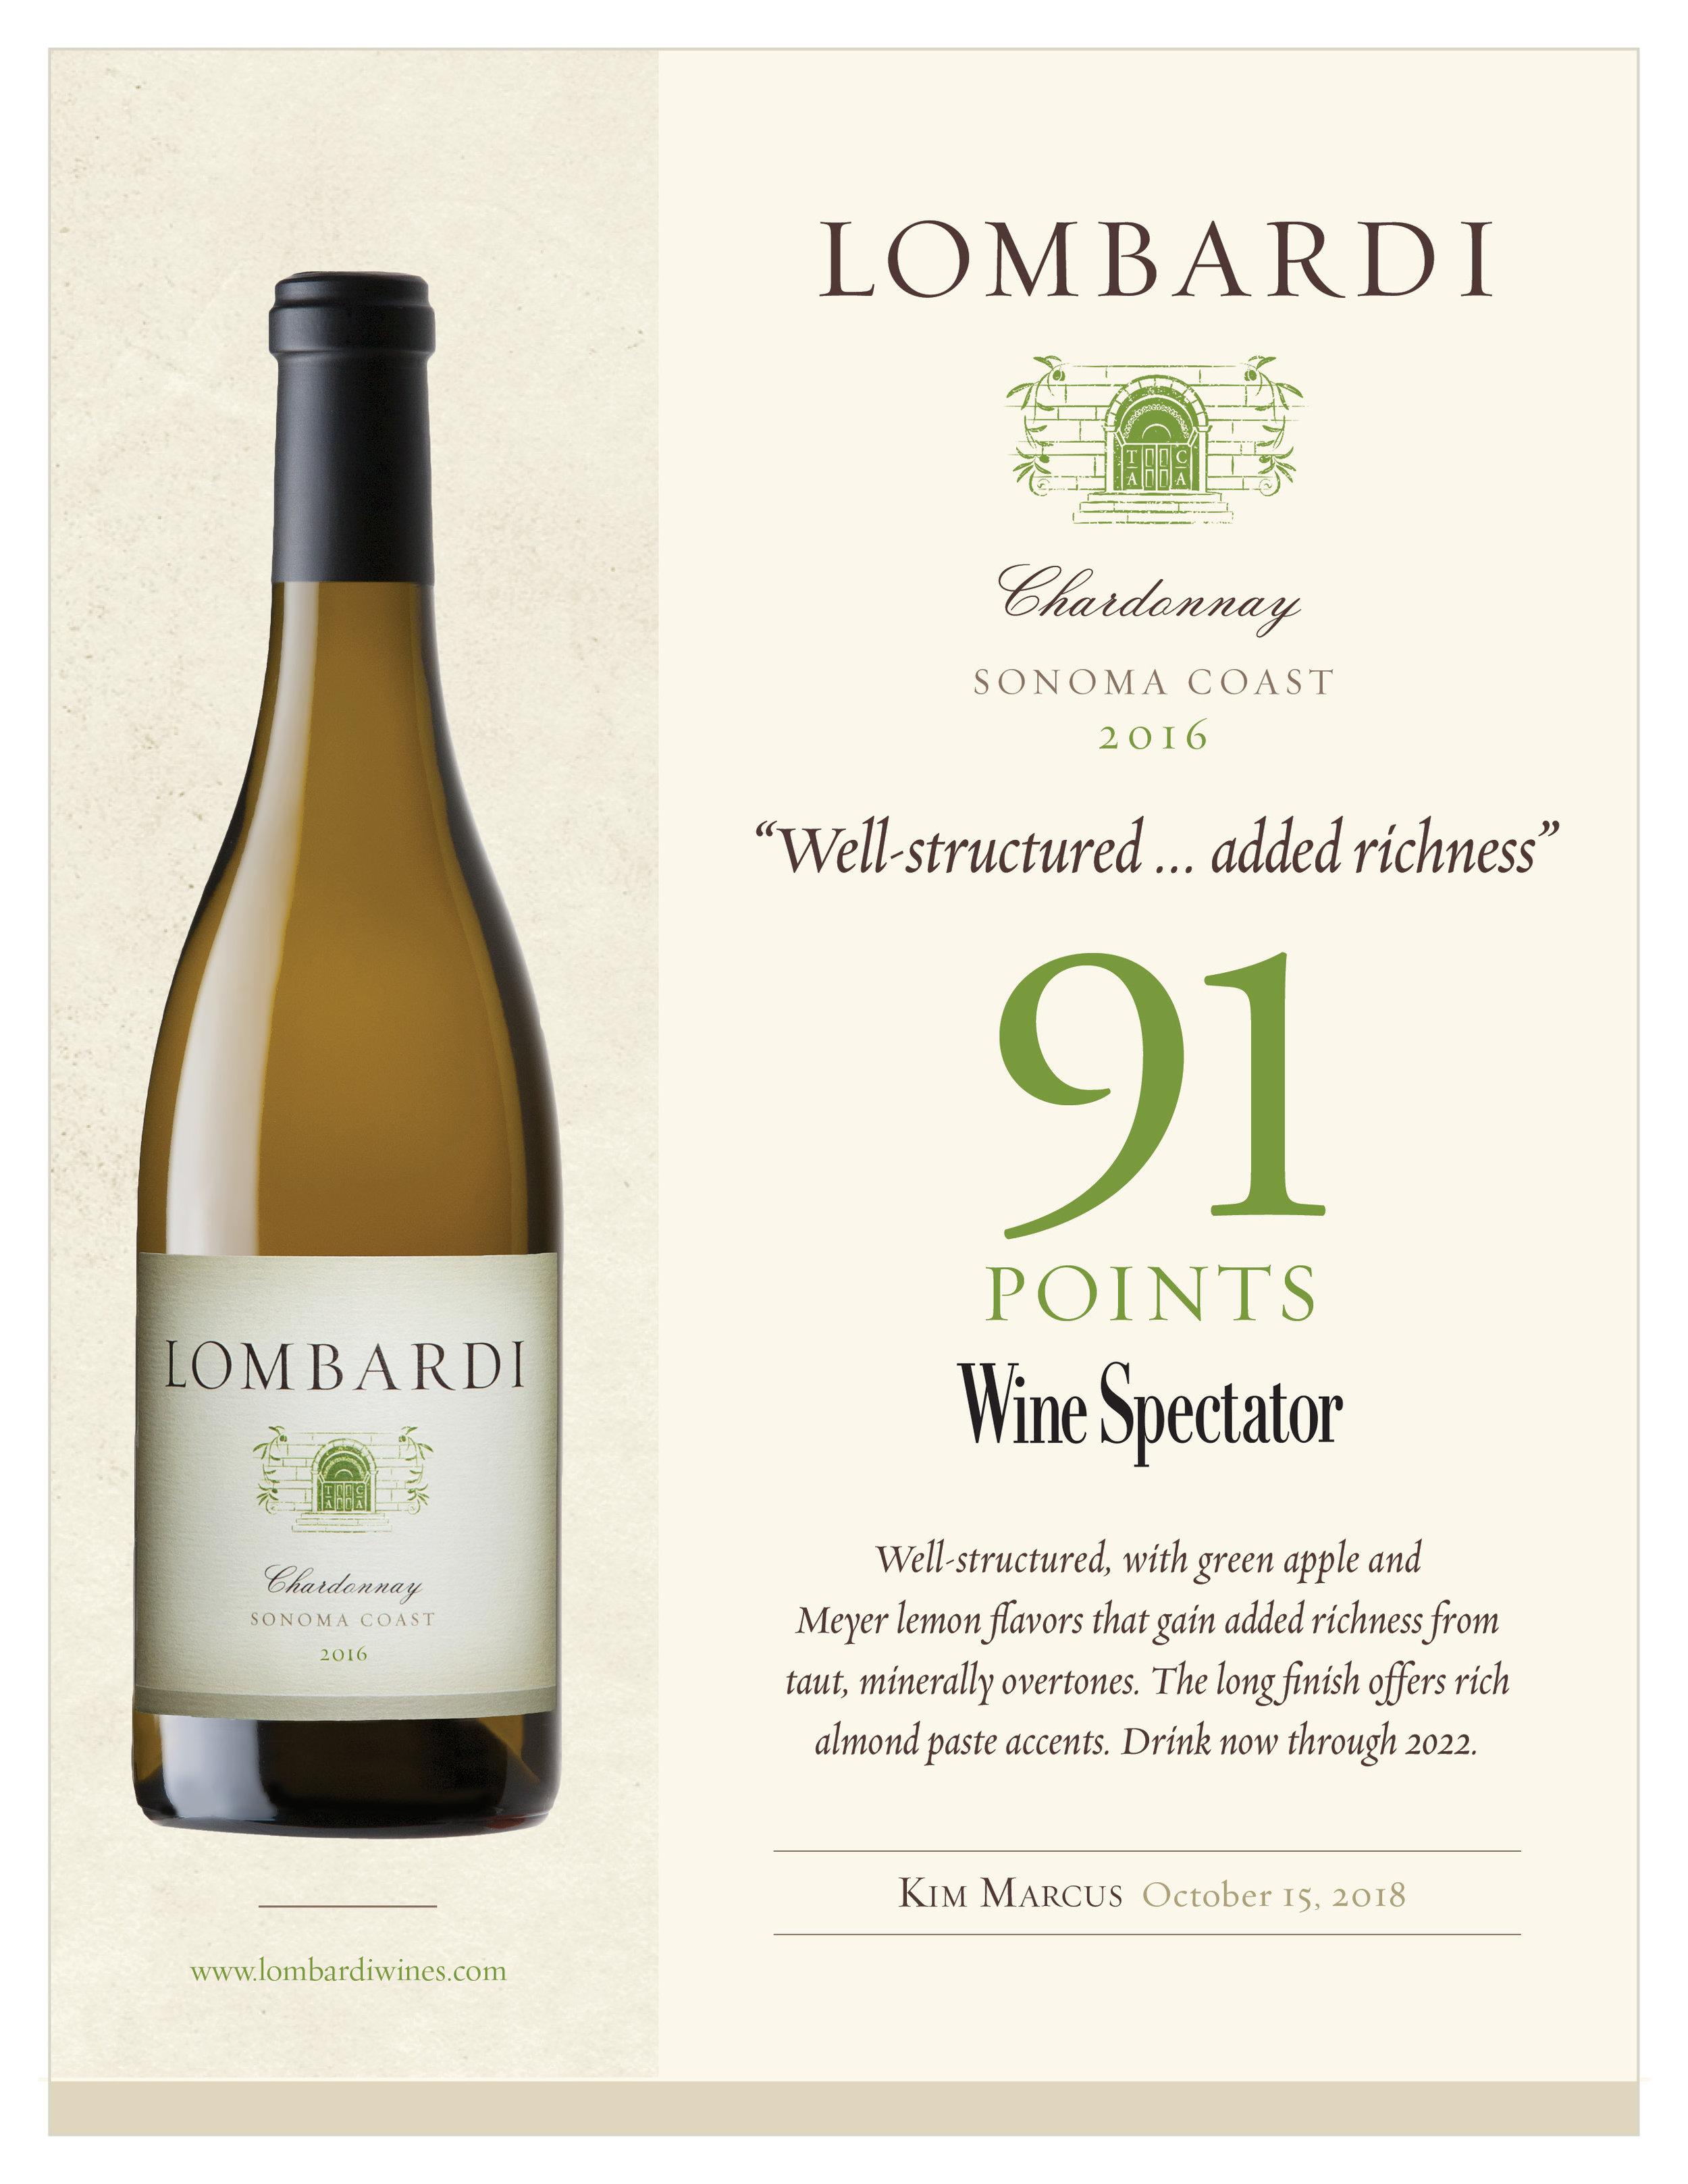 Lombardi_Chardonnay2016_WineSpectator_OCT2018.jpg